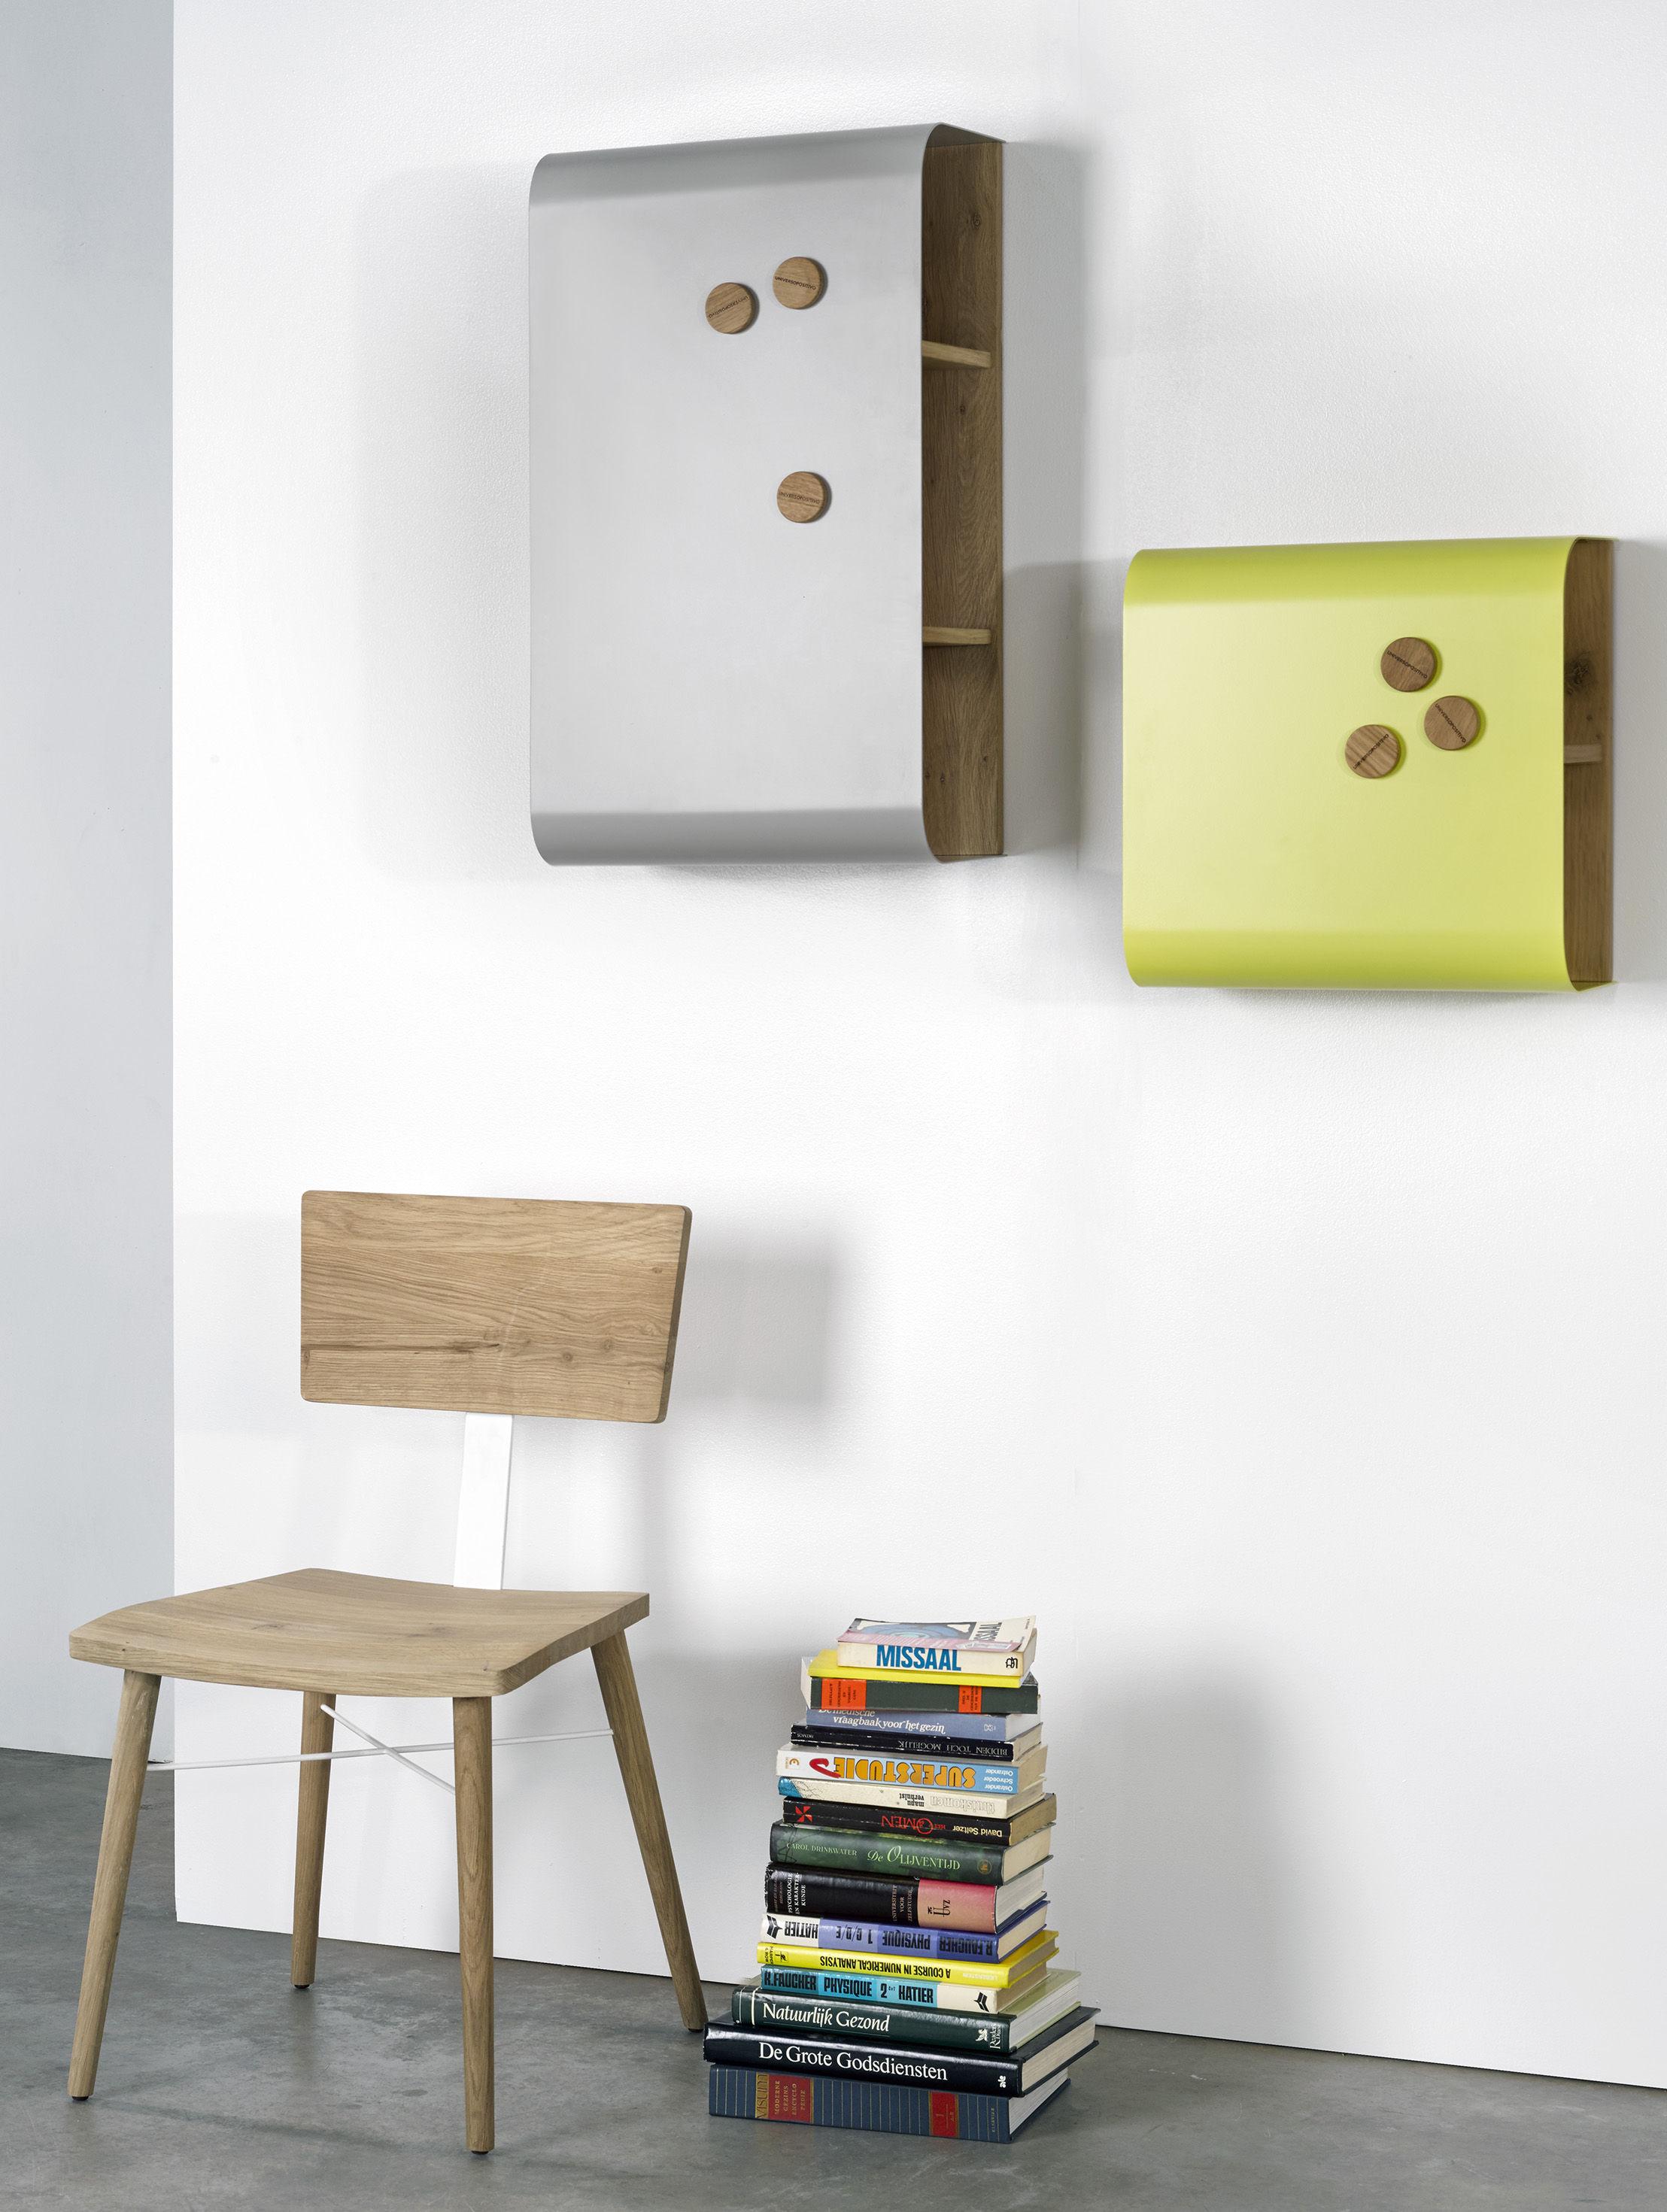 shell magnettafel 40 x 40 cm universo positivo regal. Black Bedroom Furniture Sets. Home Design Ideas